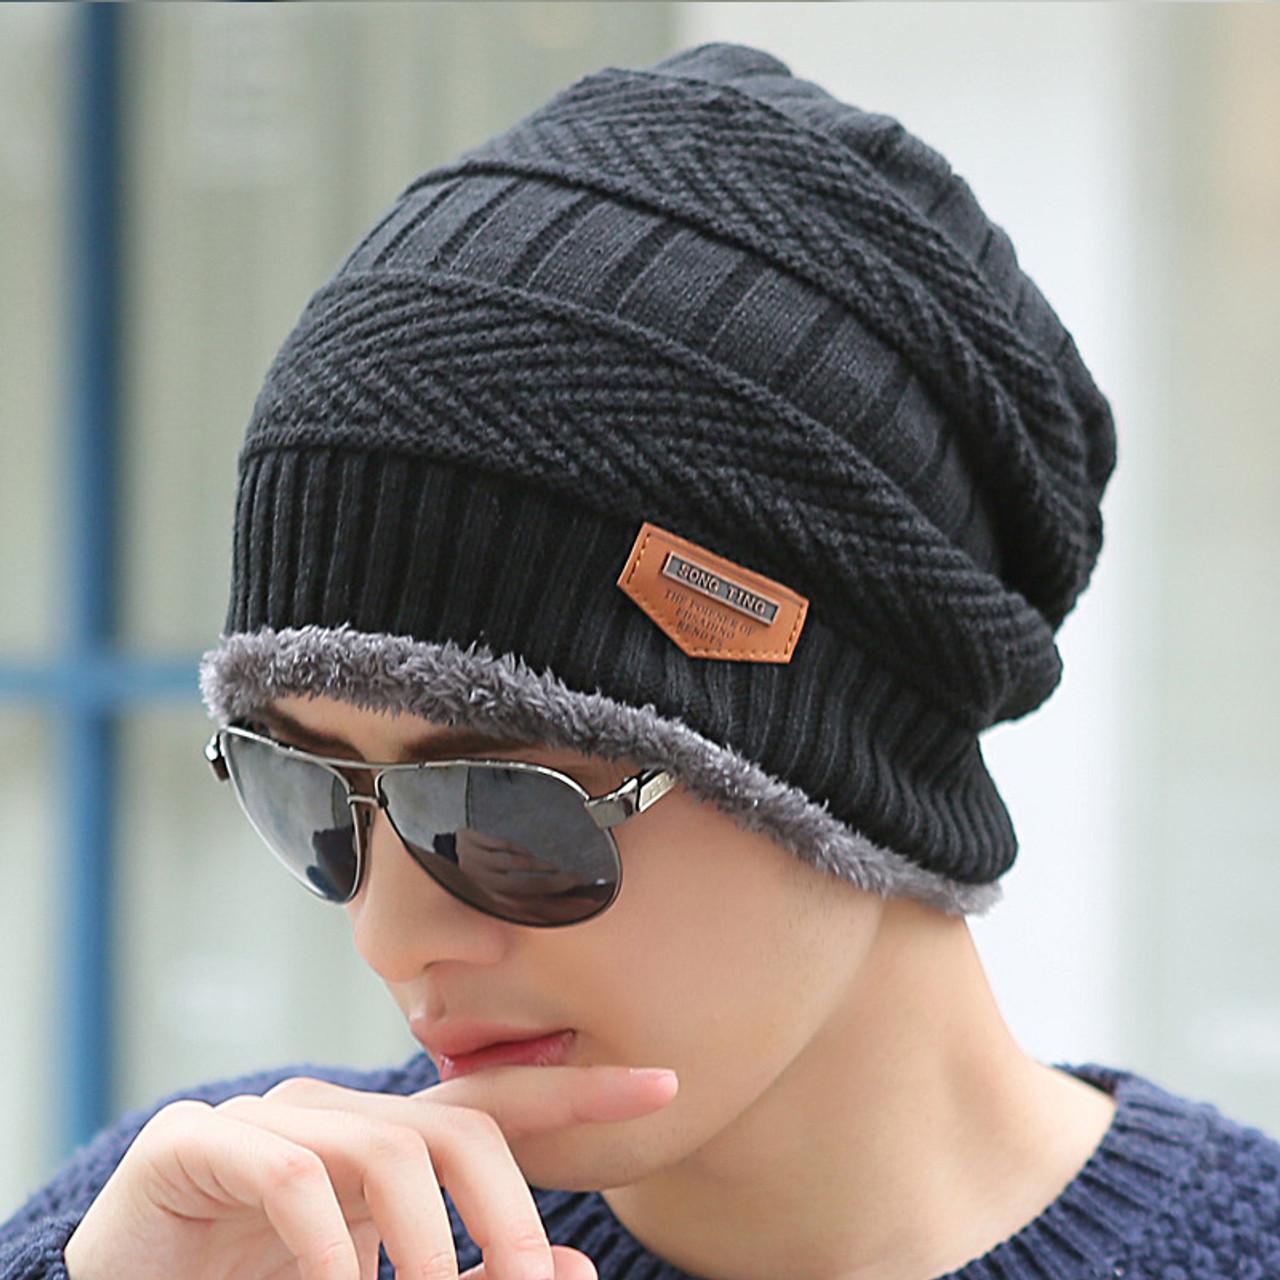 Boys Men Winter Hat Knit Scarf Cap Winter Hats for Men Caps Warm Fur  Skullies Beanie Bonnet Hat Man 2017 Mens Winter Hats - OnshopDeals.Com 79a6e2f0af2e